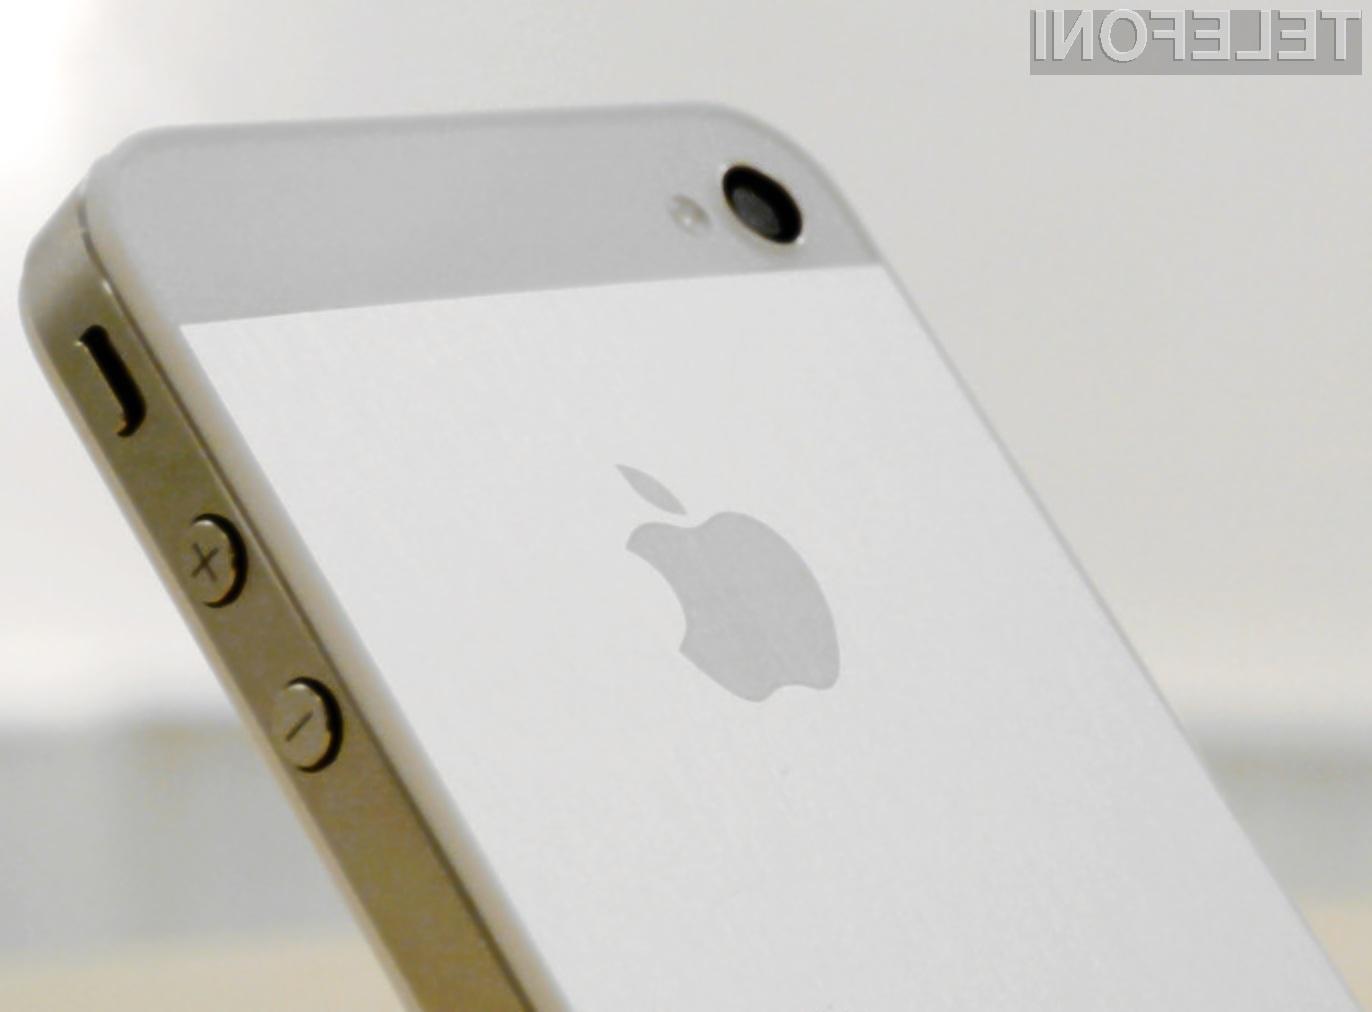 Spemenite vaš iPhone 4/4S v novi iPhone 5